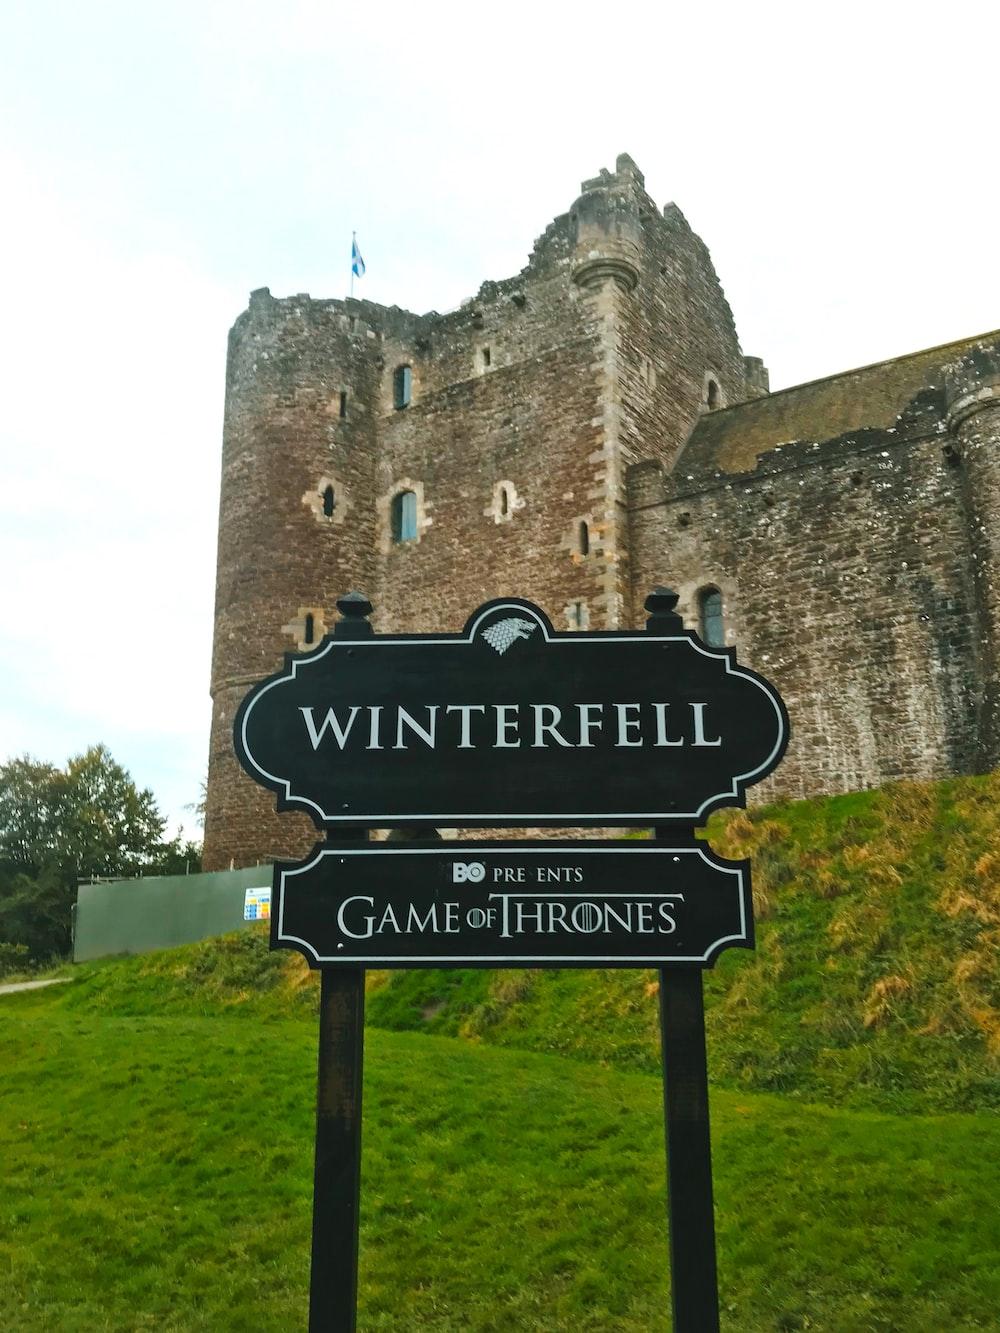 Winterfell signage